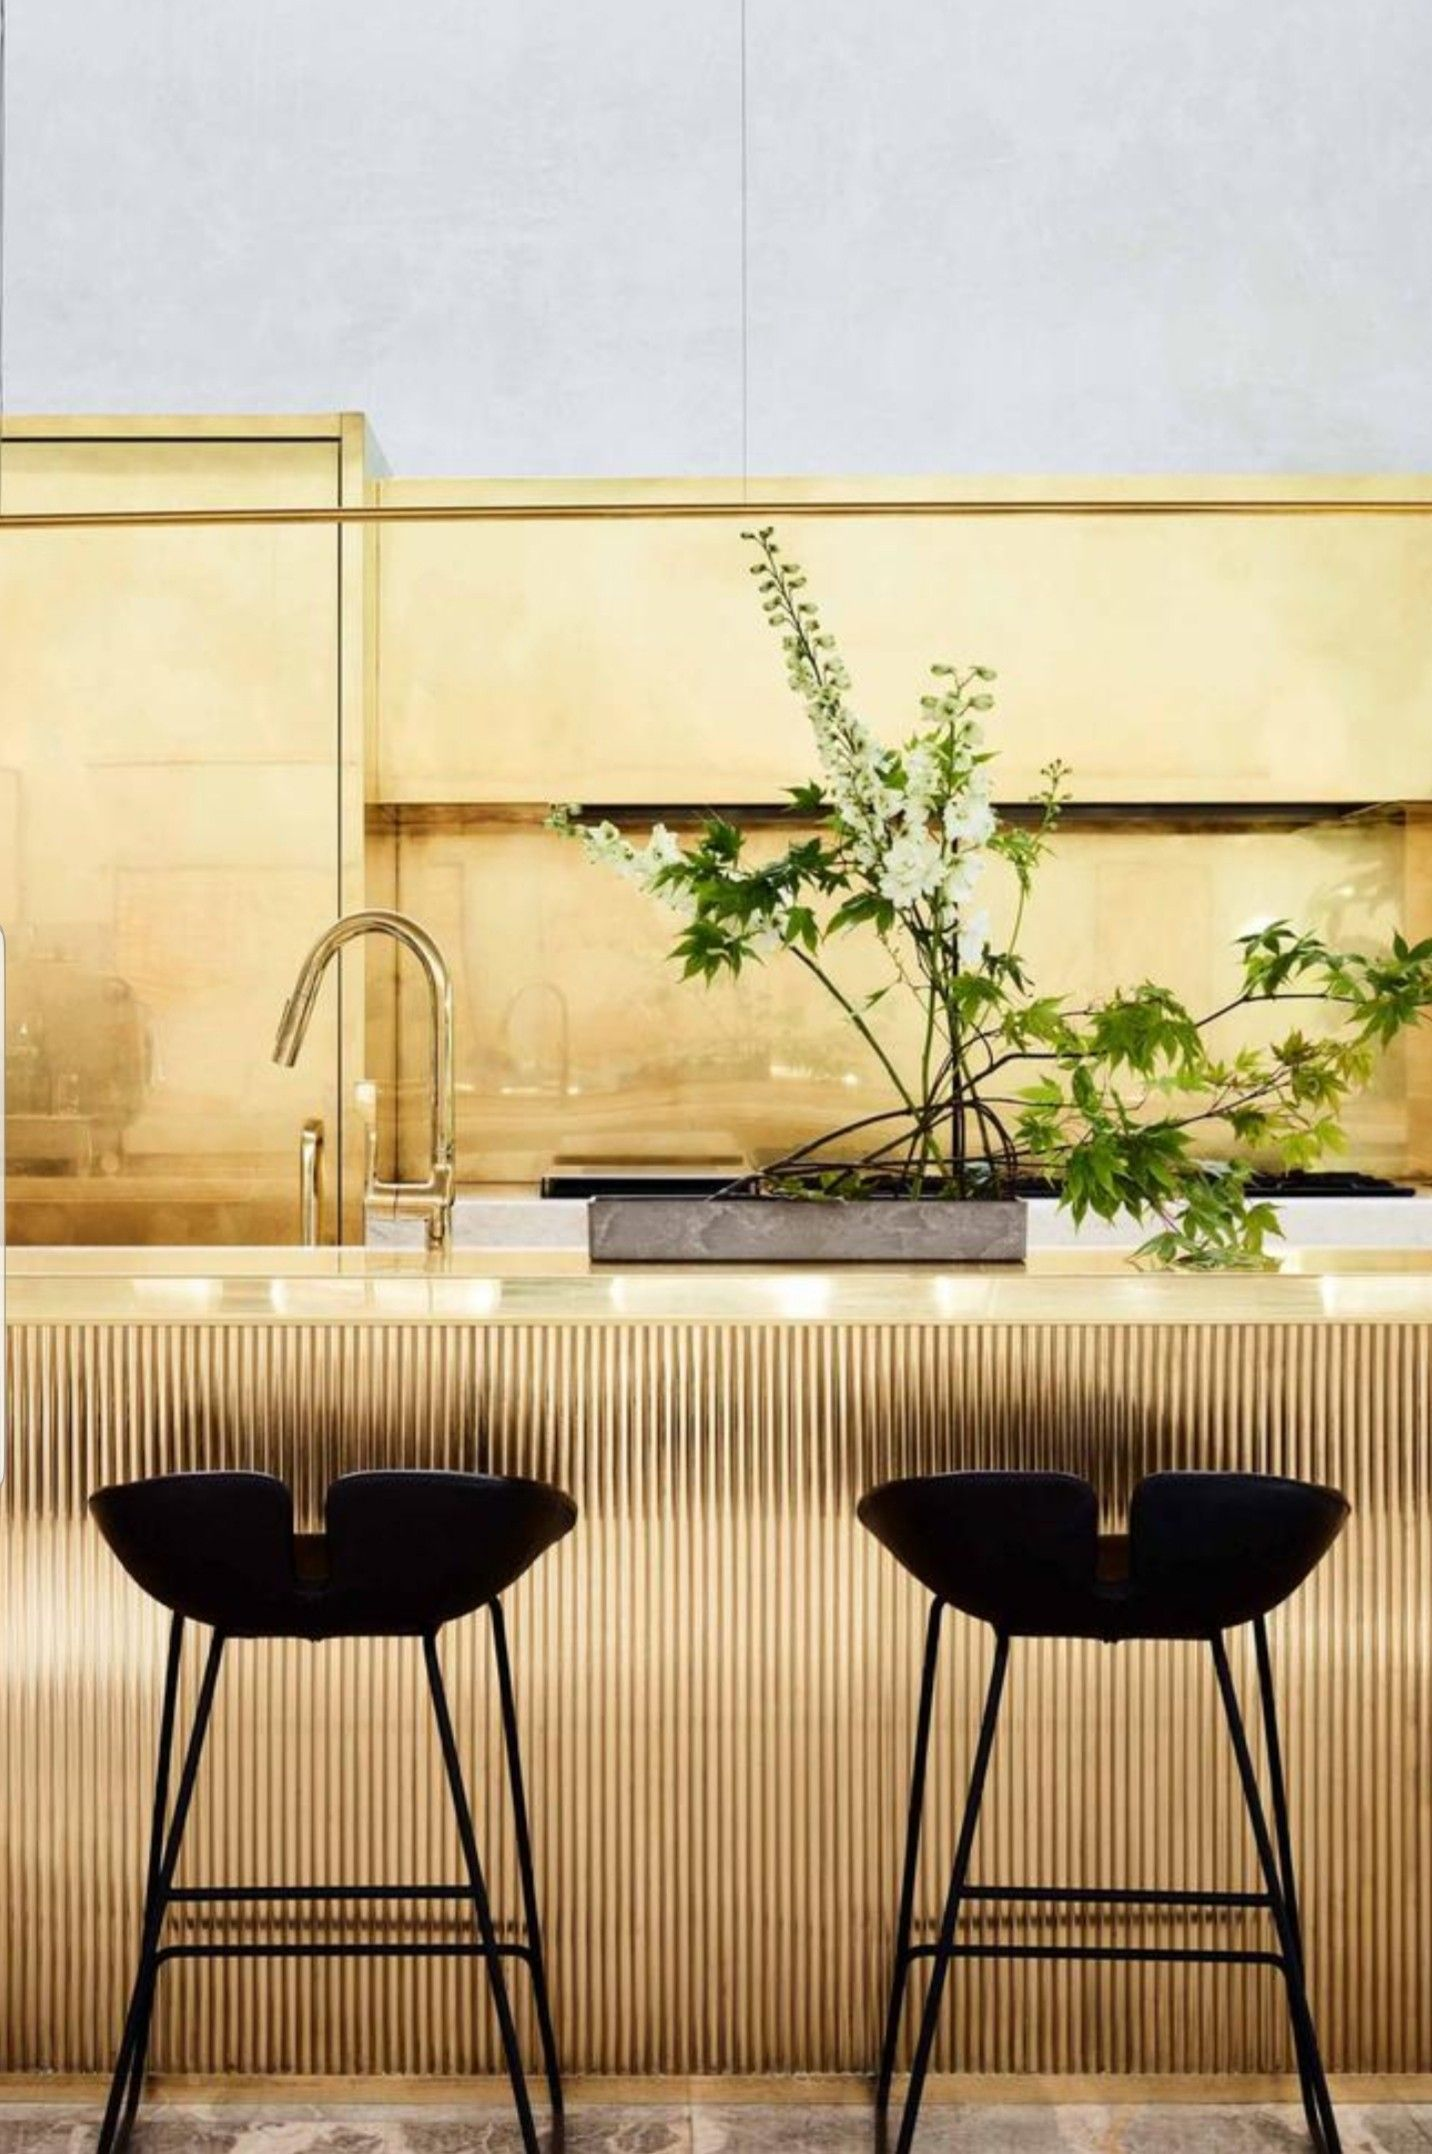 Rob Mills. Diy kitchen projects, Gold kitchen, Interior